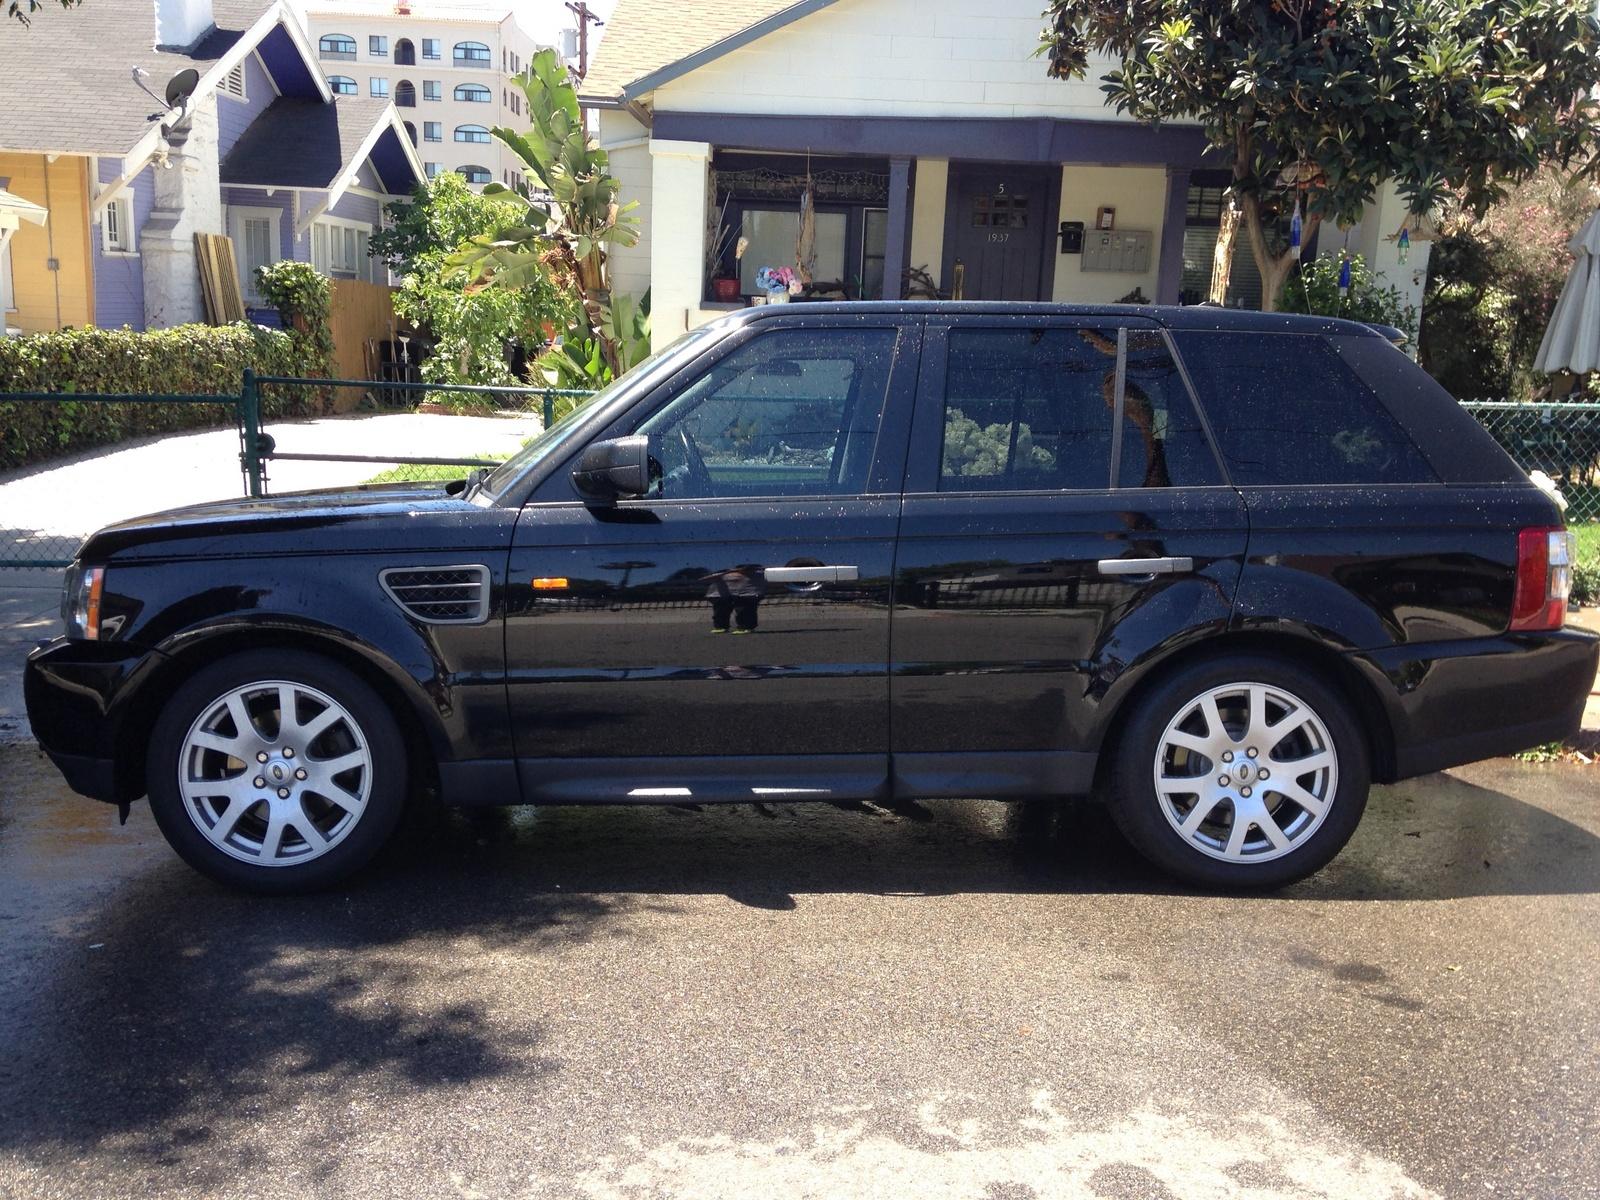 Range Rover Sport Lease Price Los Angeles Range rover sport suv